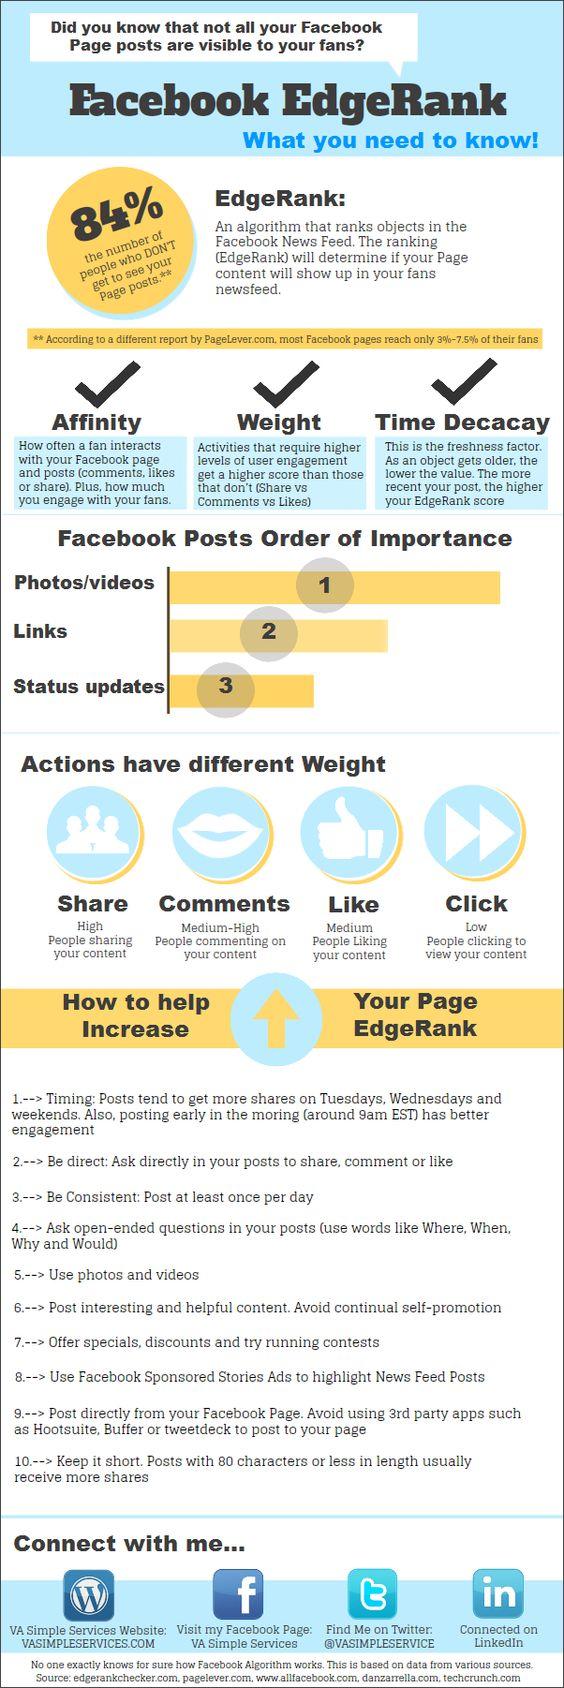 Great infographic explaining Facebook's EdgeRank.